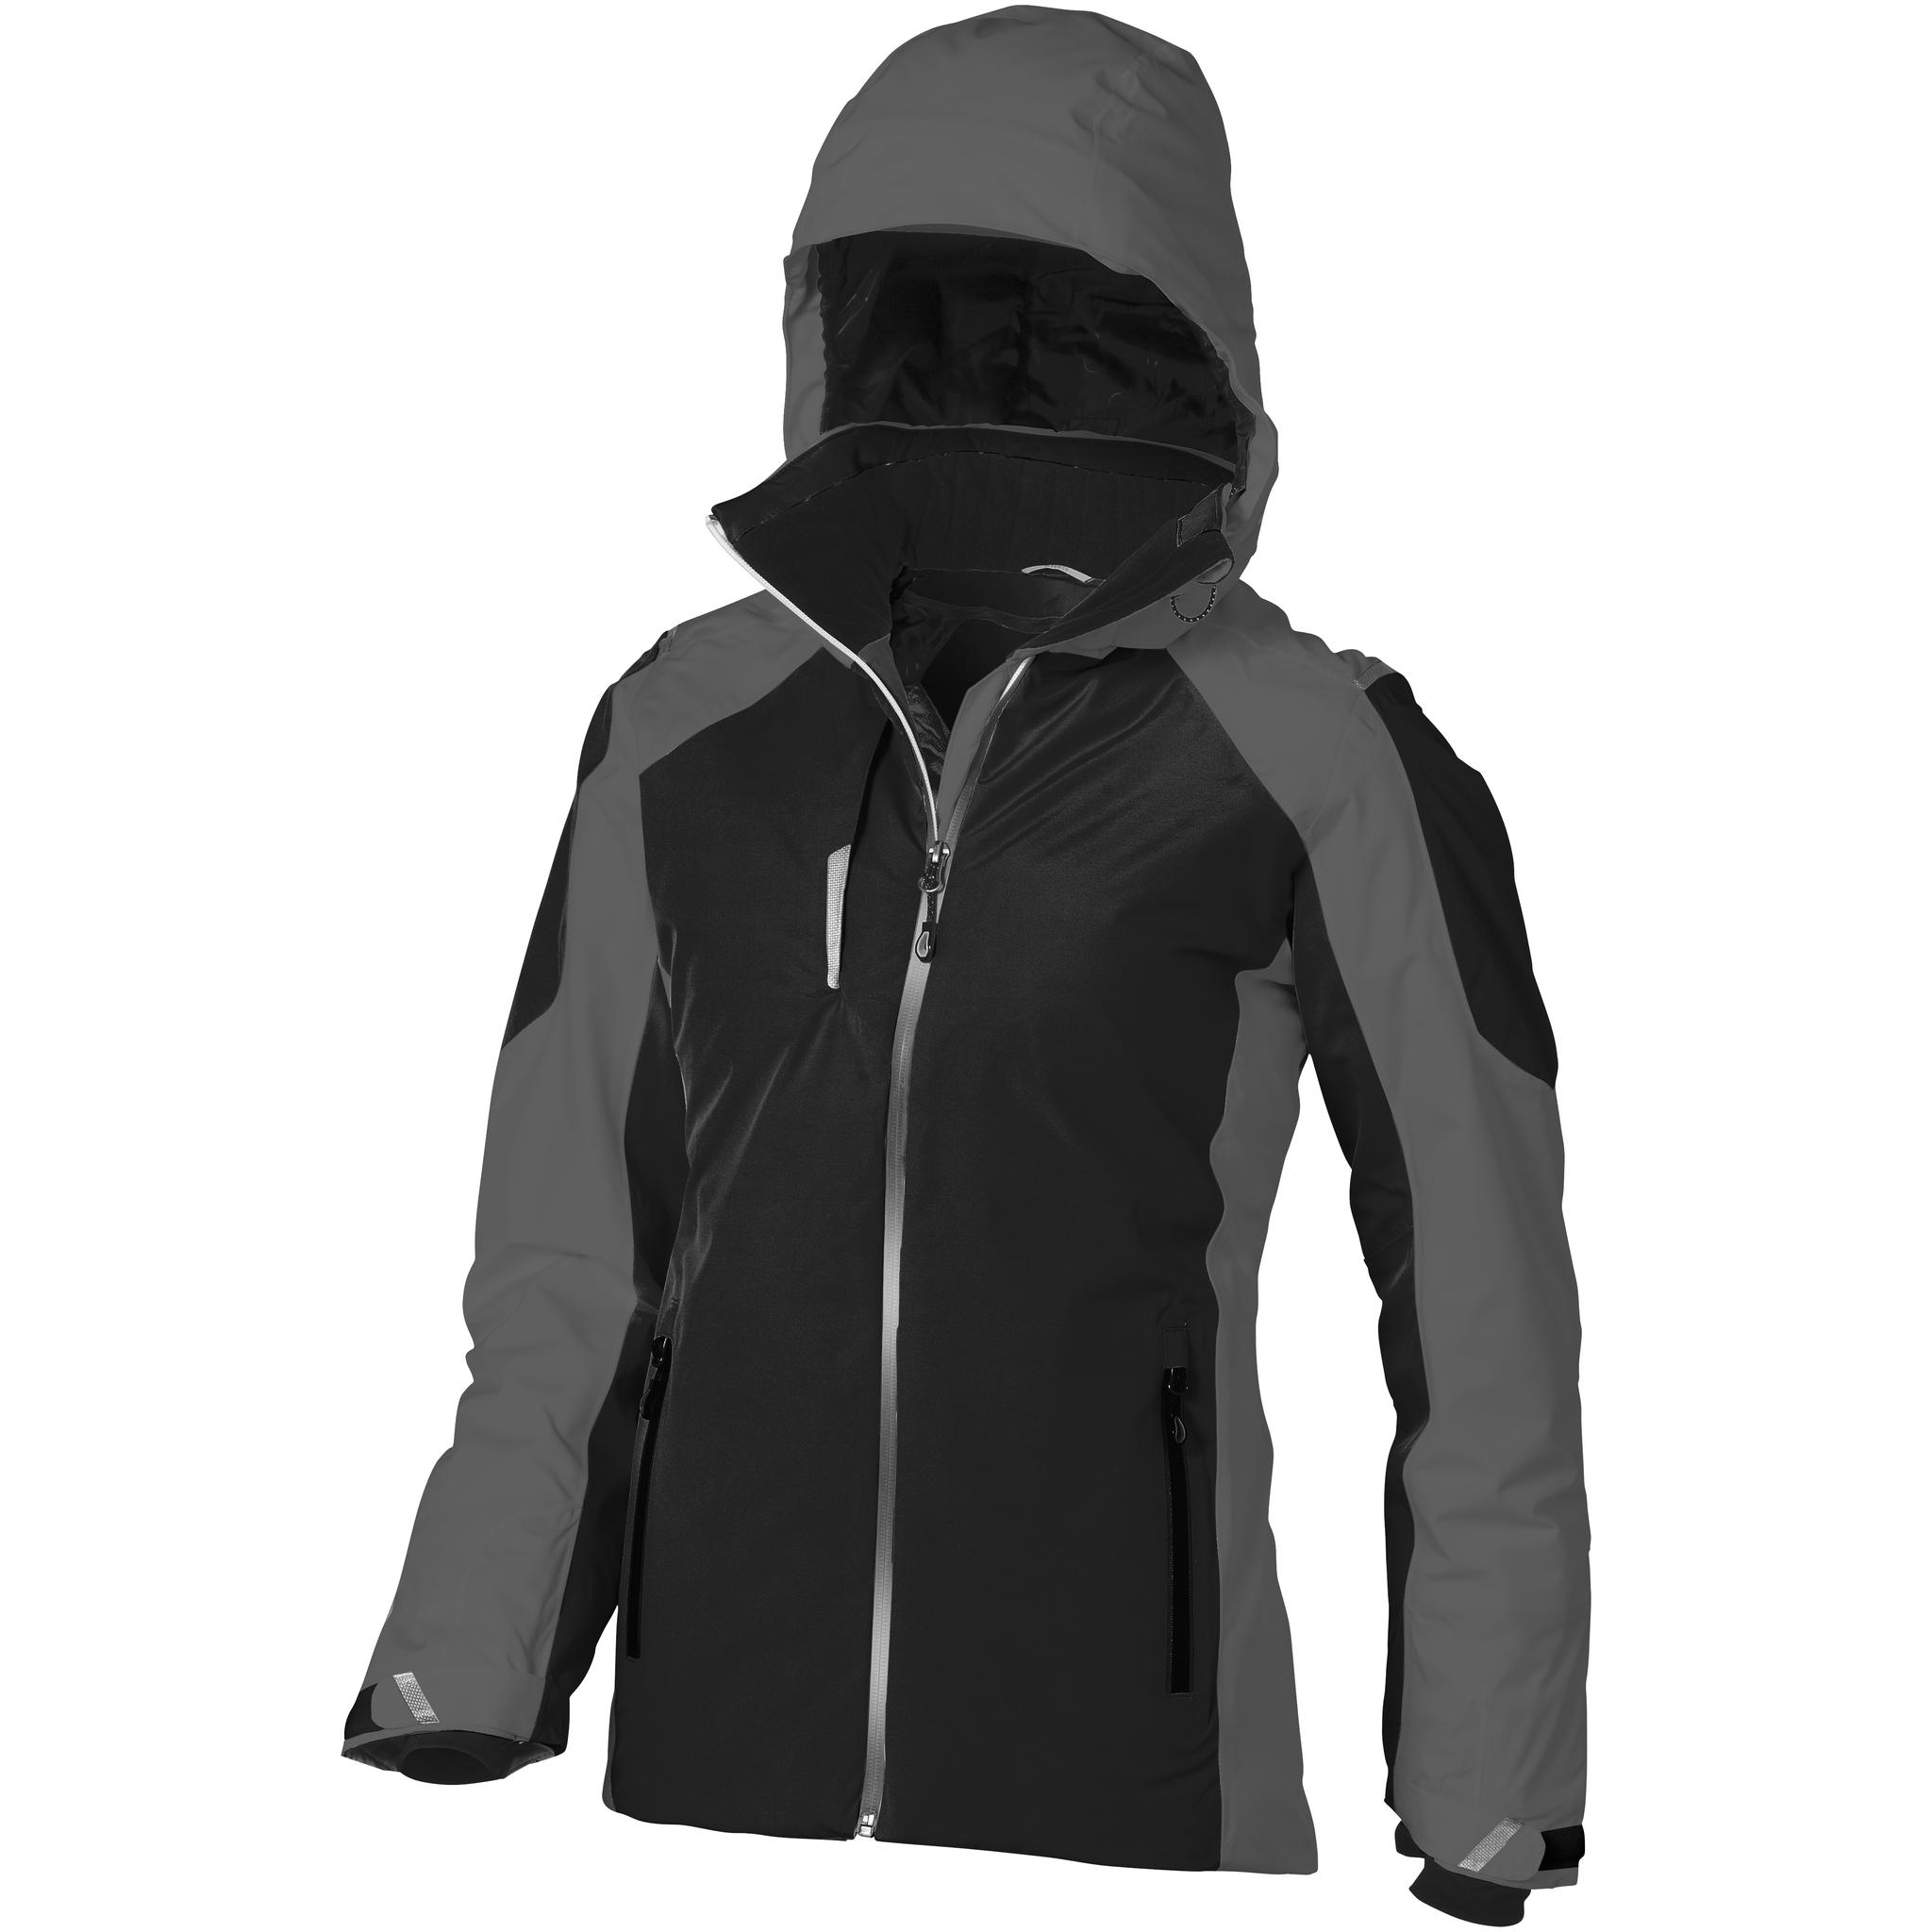 Elevate Womens/Ladies Ozark Insulated Jacket (XL) (Solid Black/Grey)